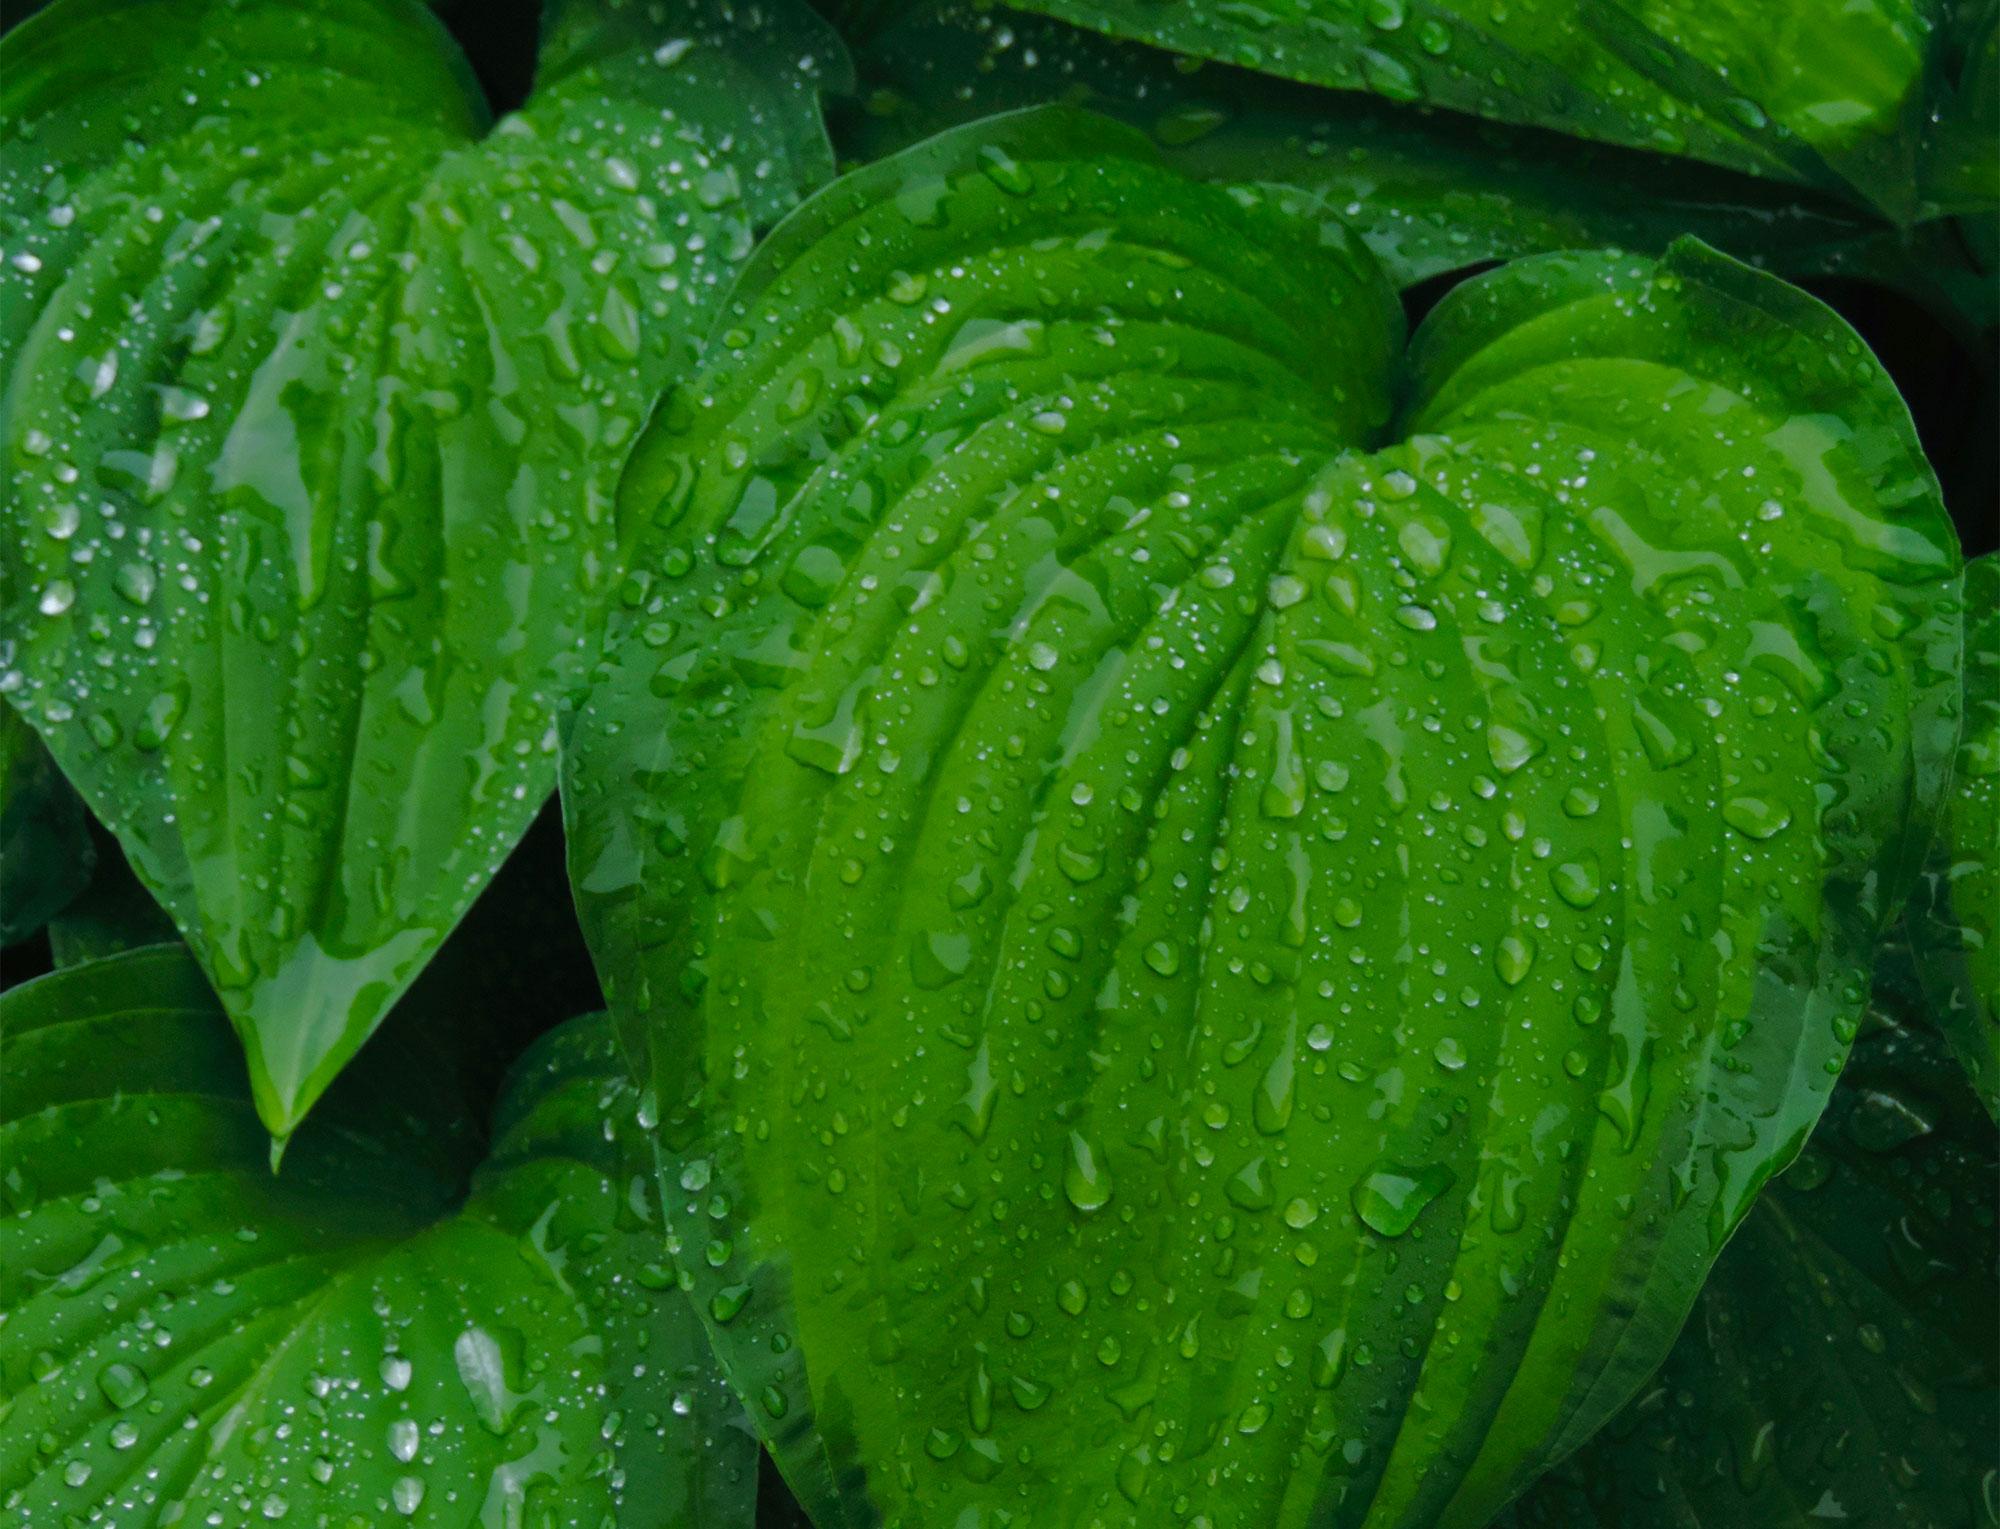 Raindrops on hosta leaves.